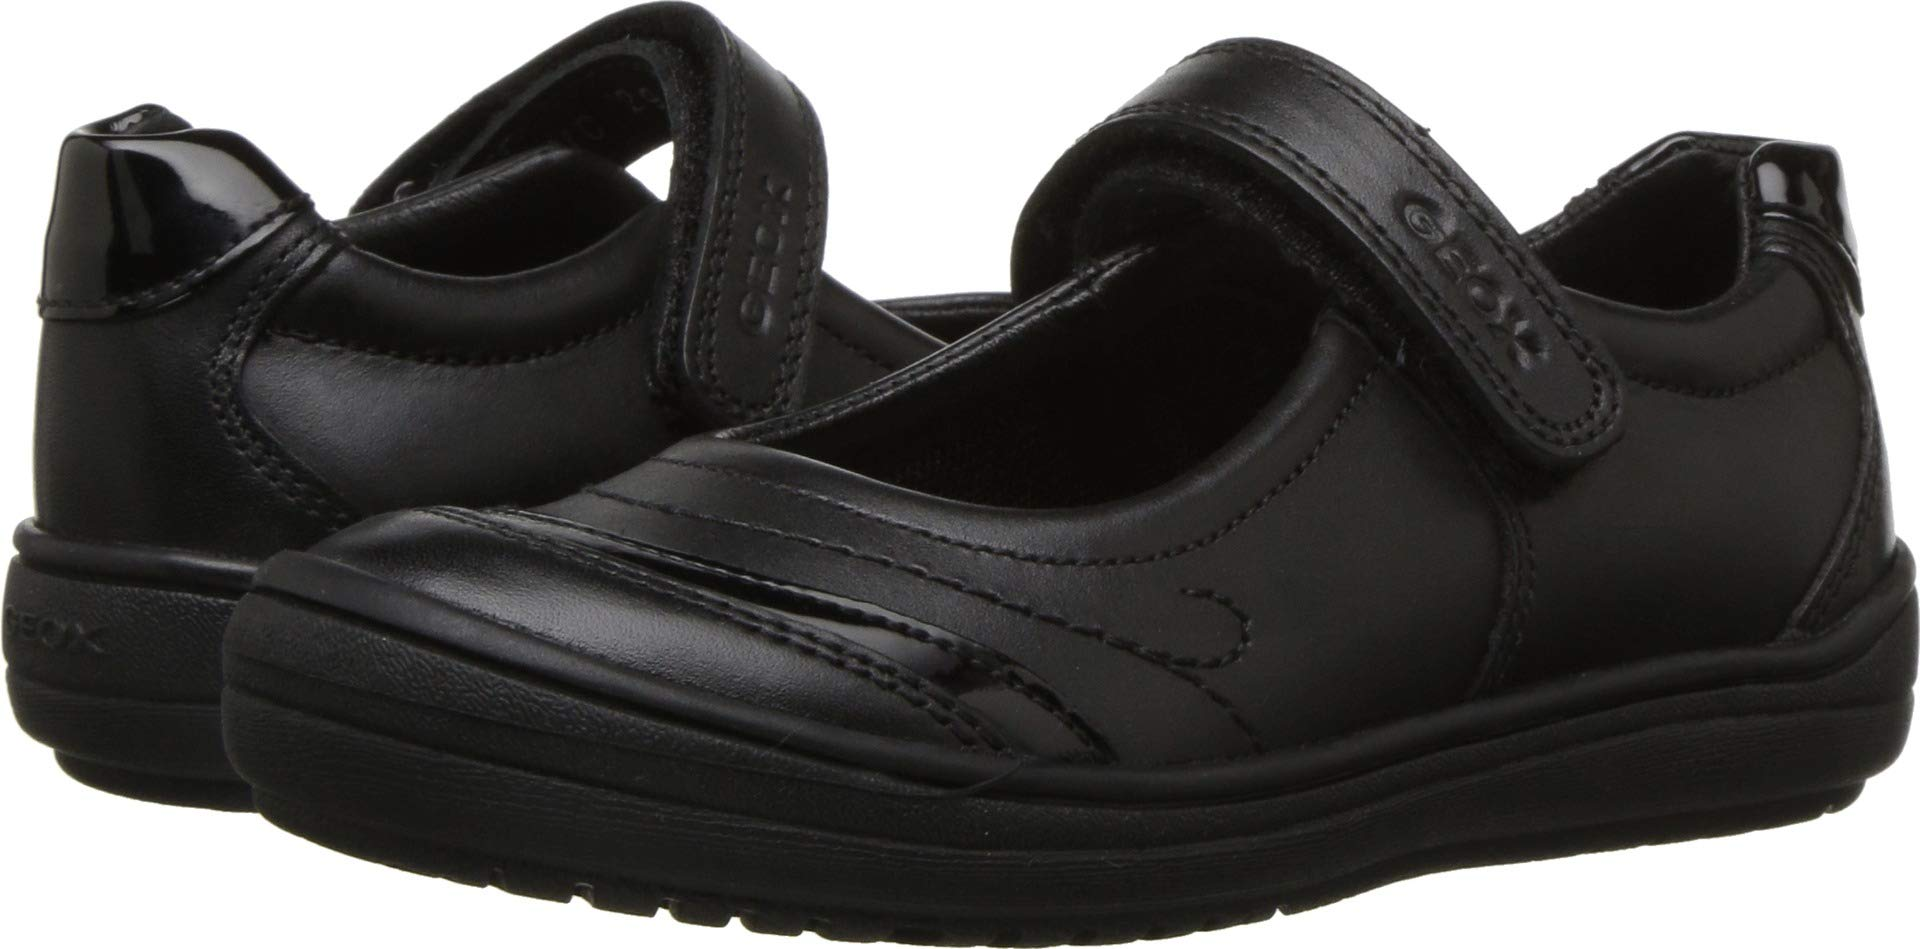 Geox Hadriel Girl 1 Mary Jane Shoe School